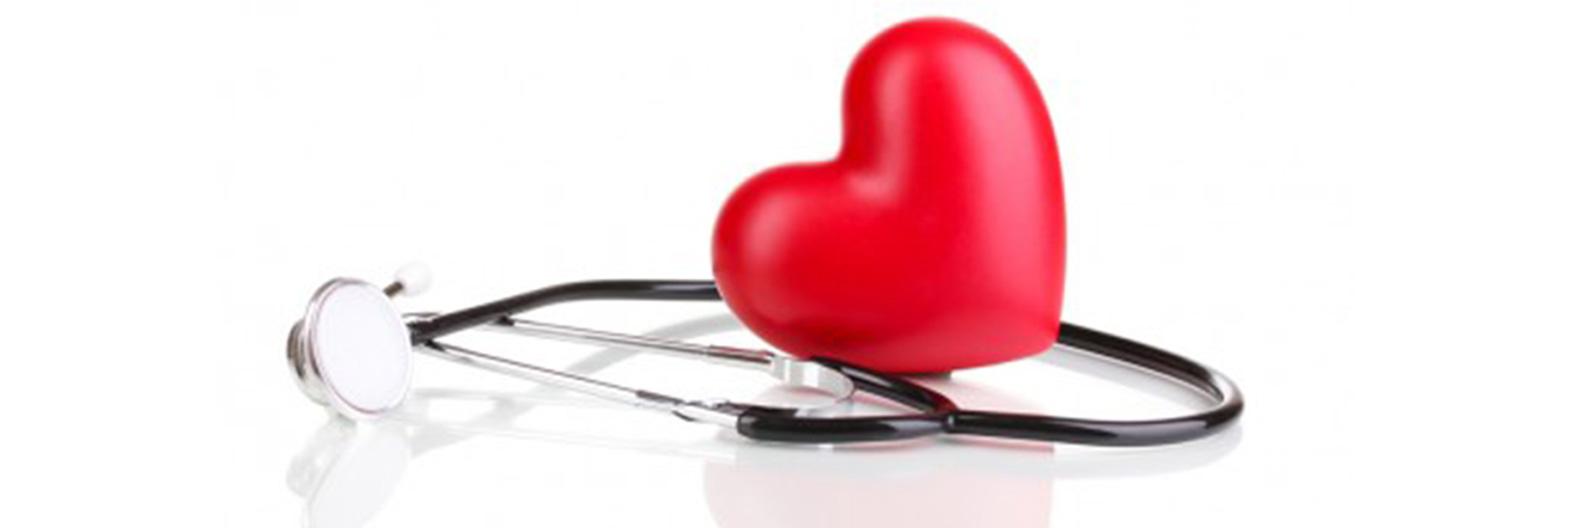 kas yra hipertenzija hipertenzija)